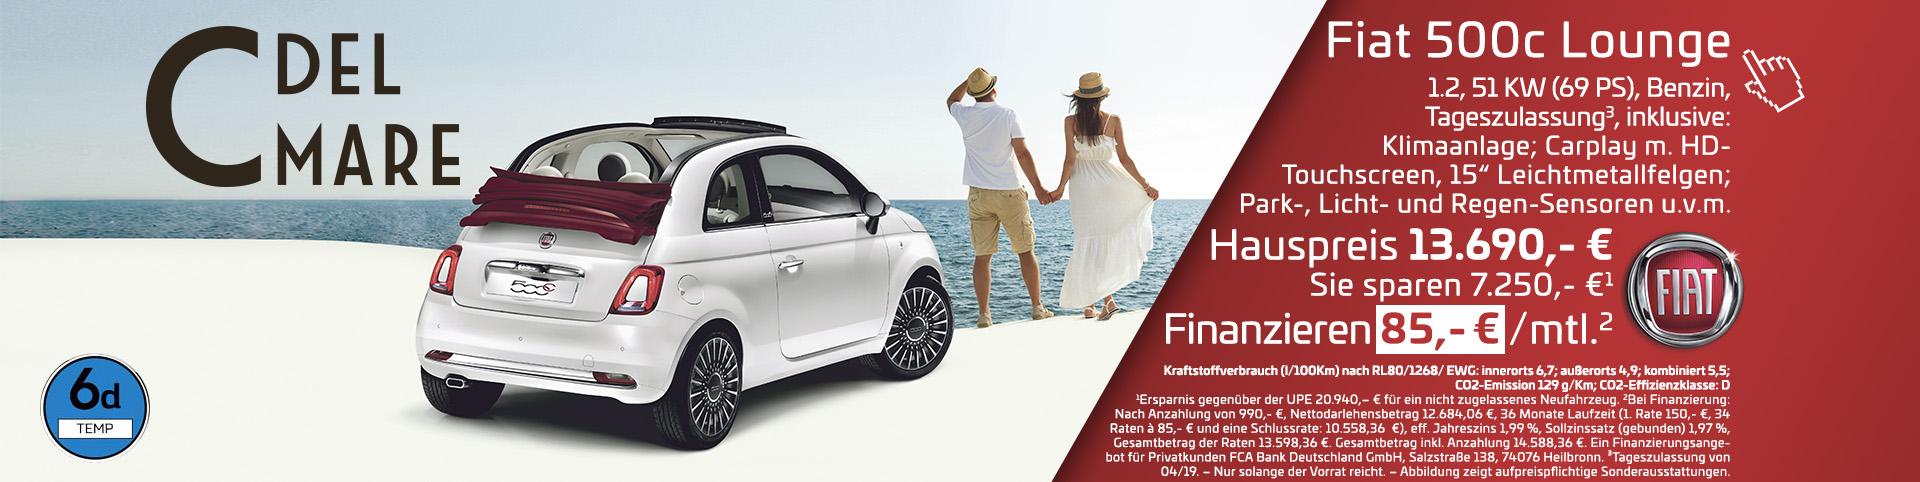 Fiat 500C Finanzierung 85 Euro pro Monat